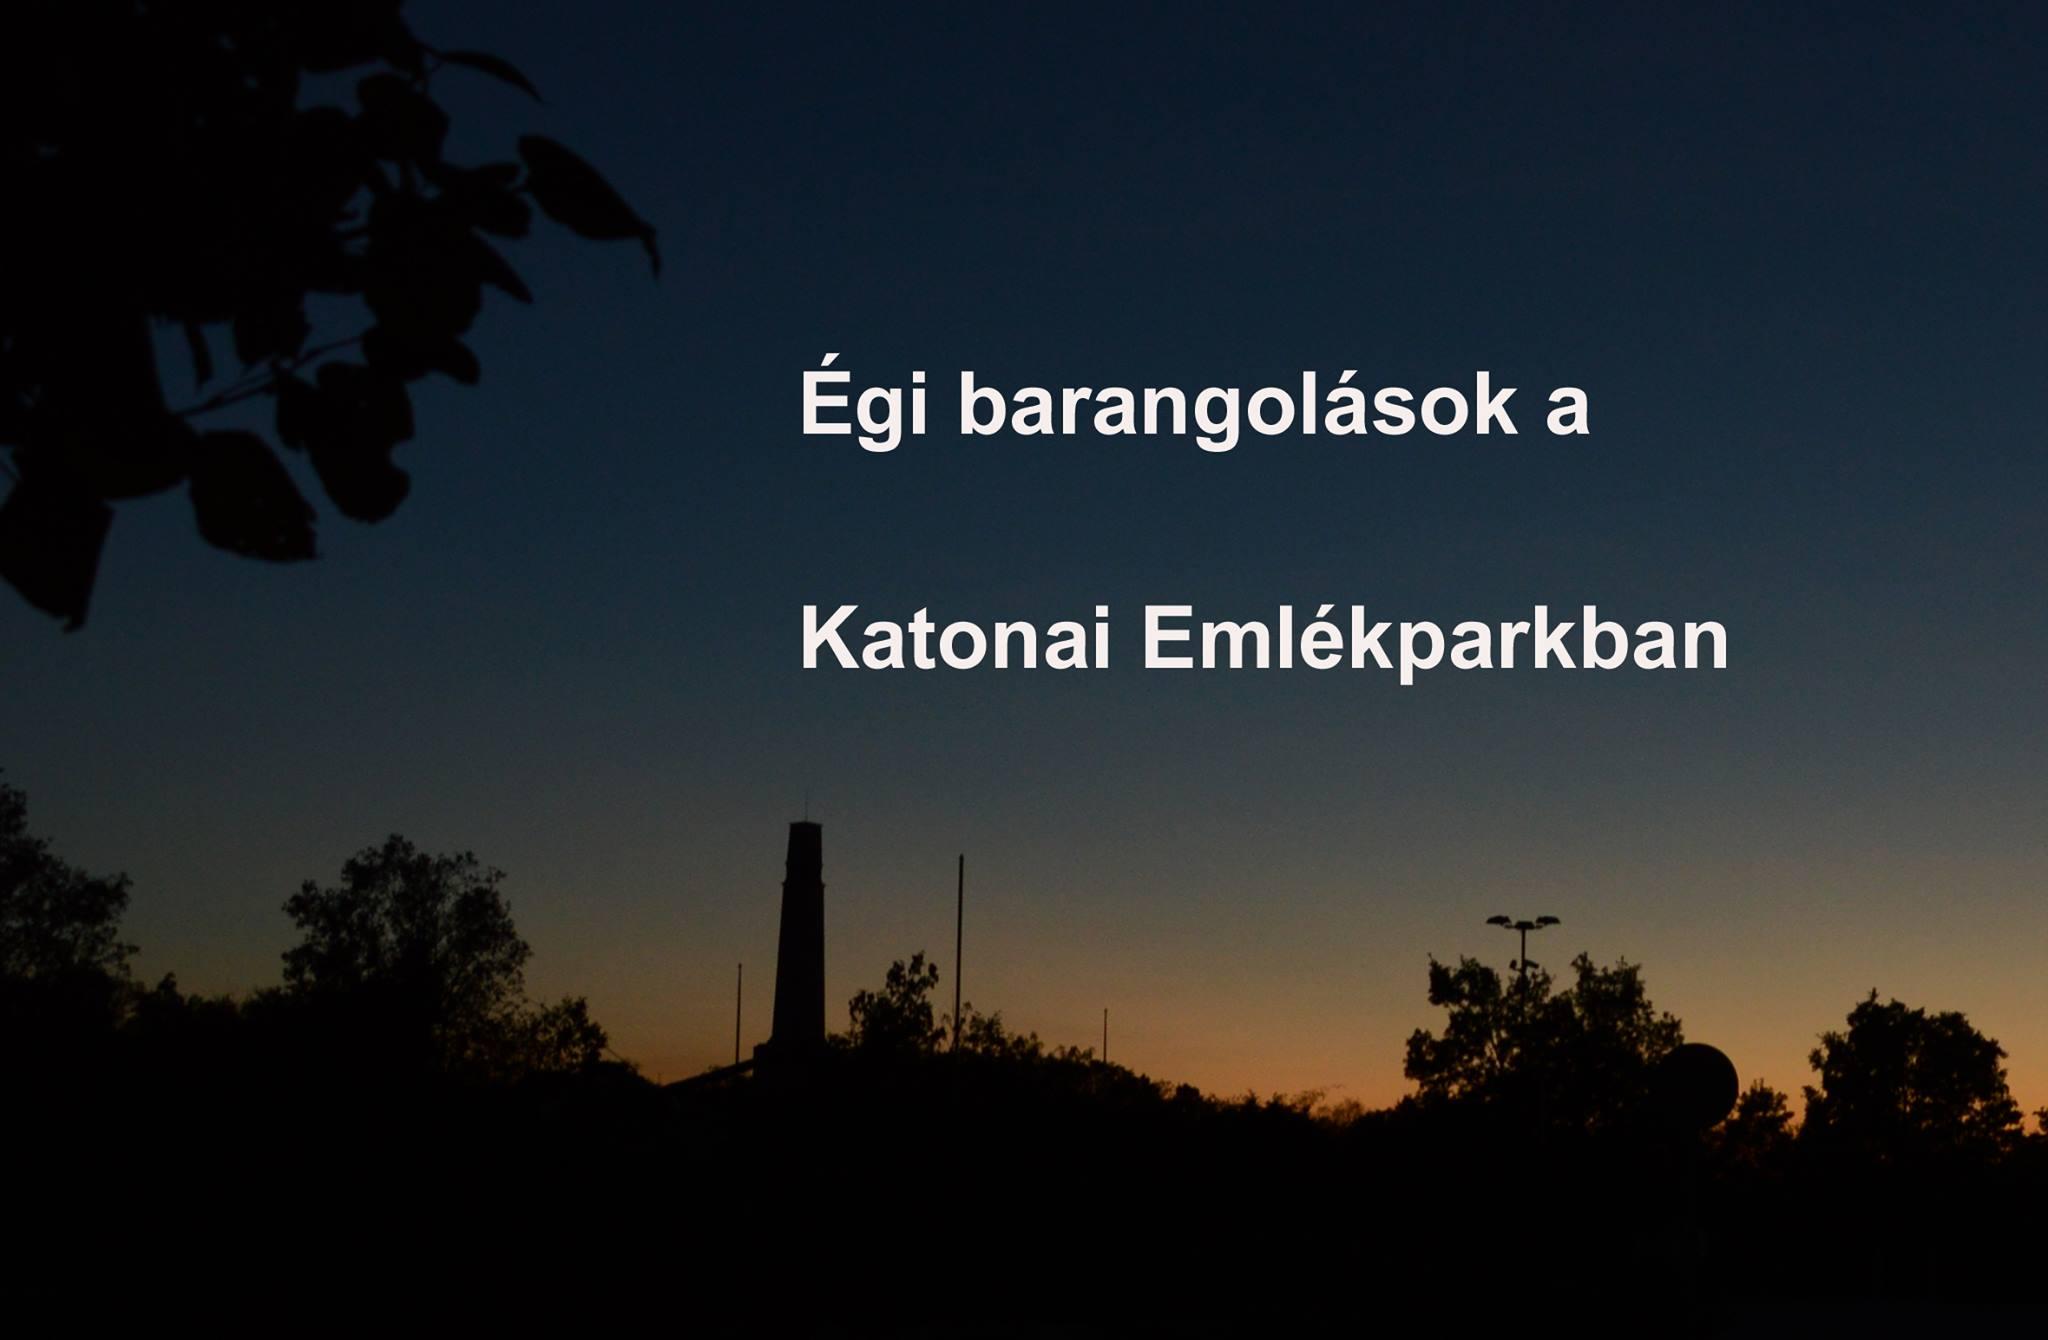 egi_barangolasok